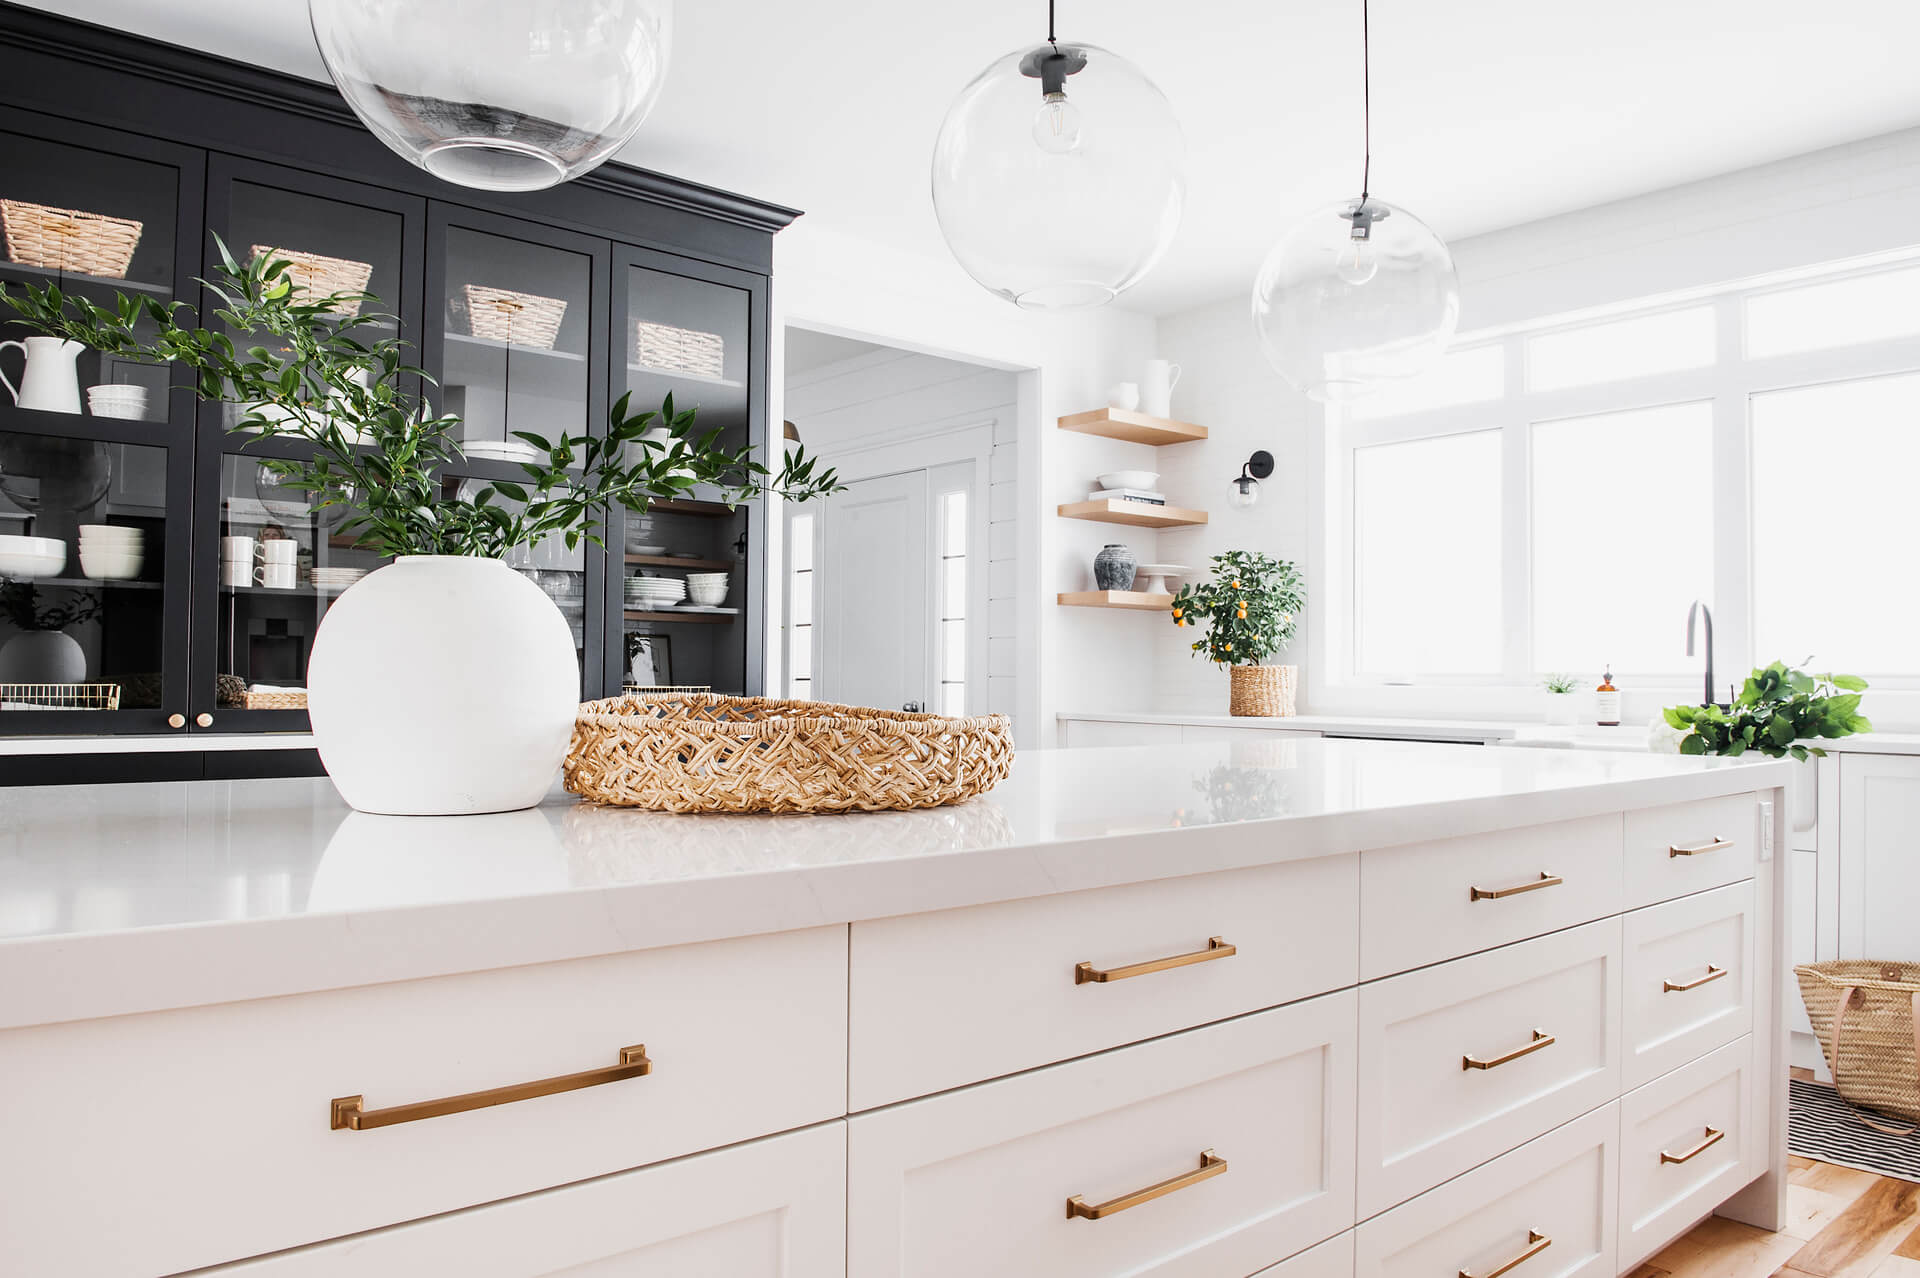 AKB Design cuisine blanche armoire noire poignee laiton comptoir quartz garde manger 6